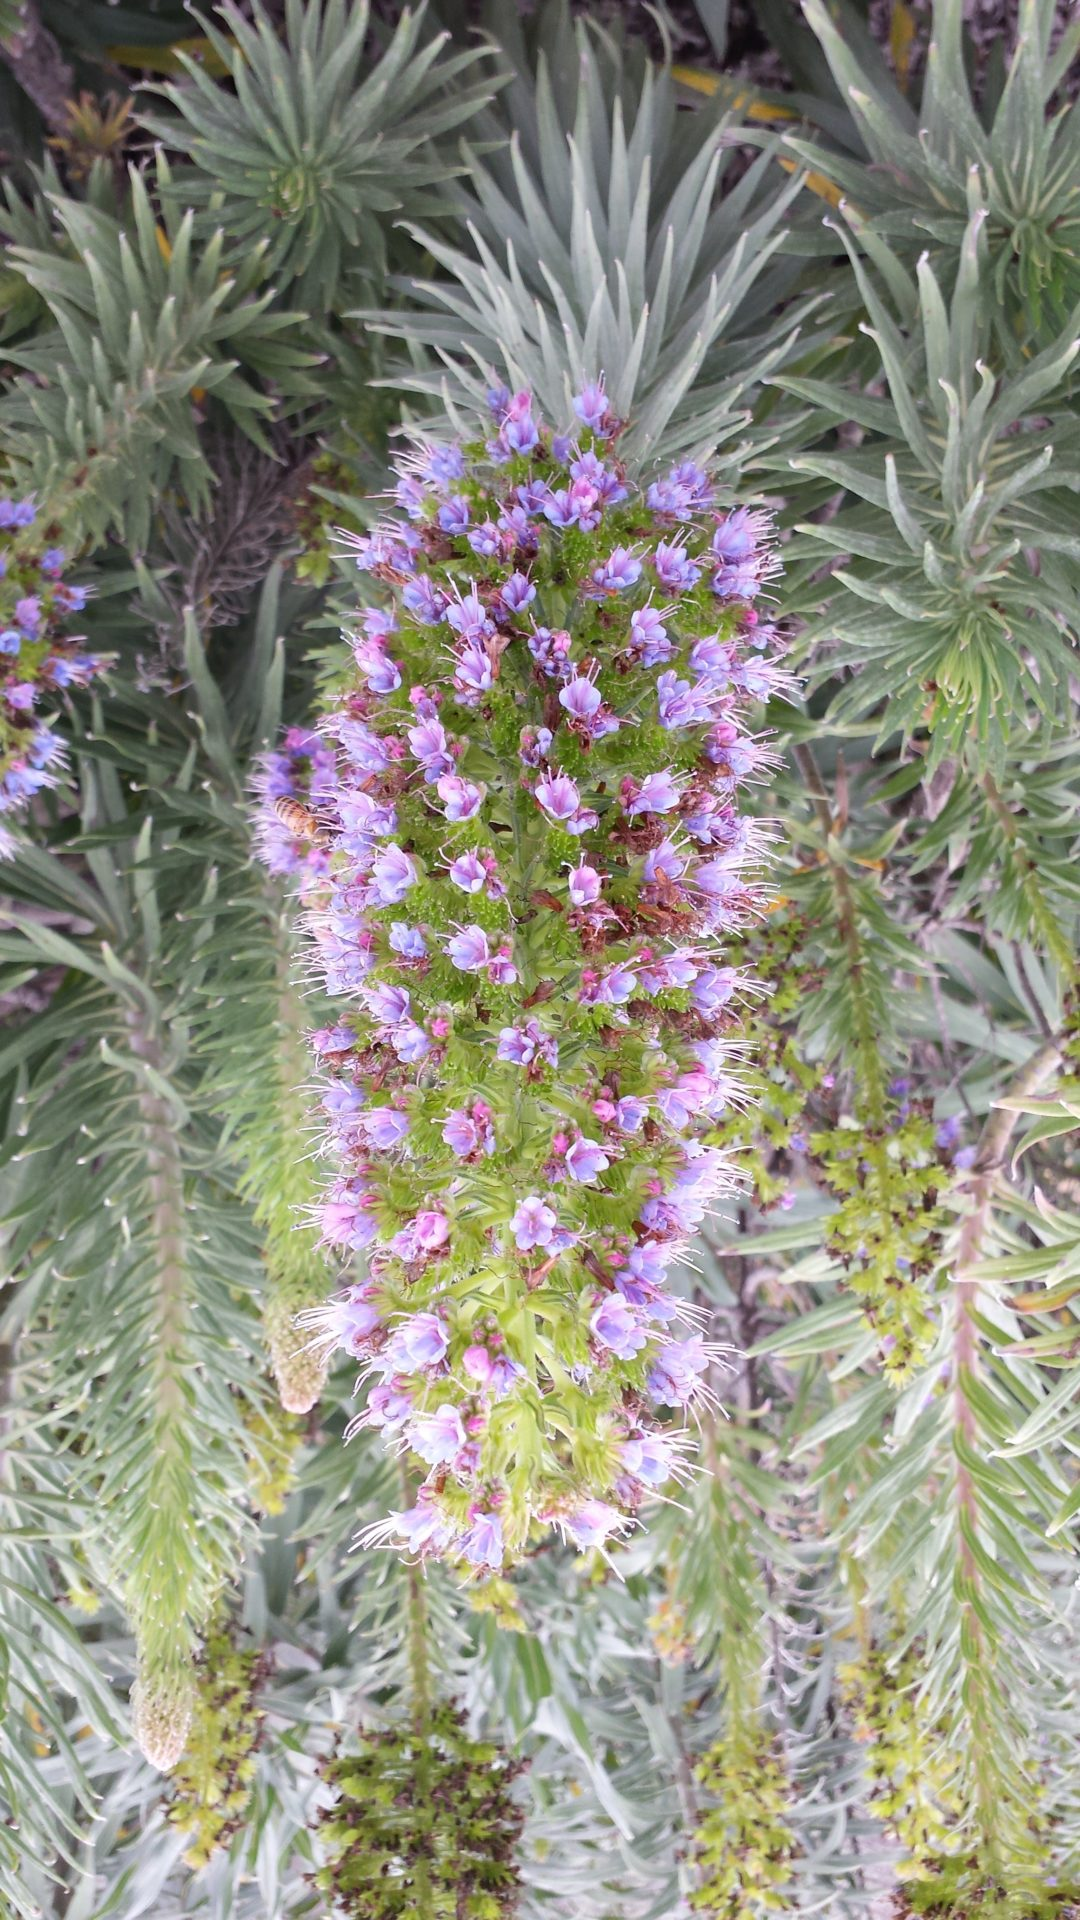 Prickly Purple Porcupine Pineapple Plant